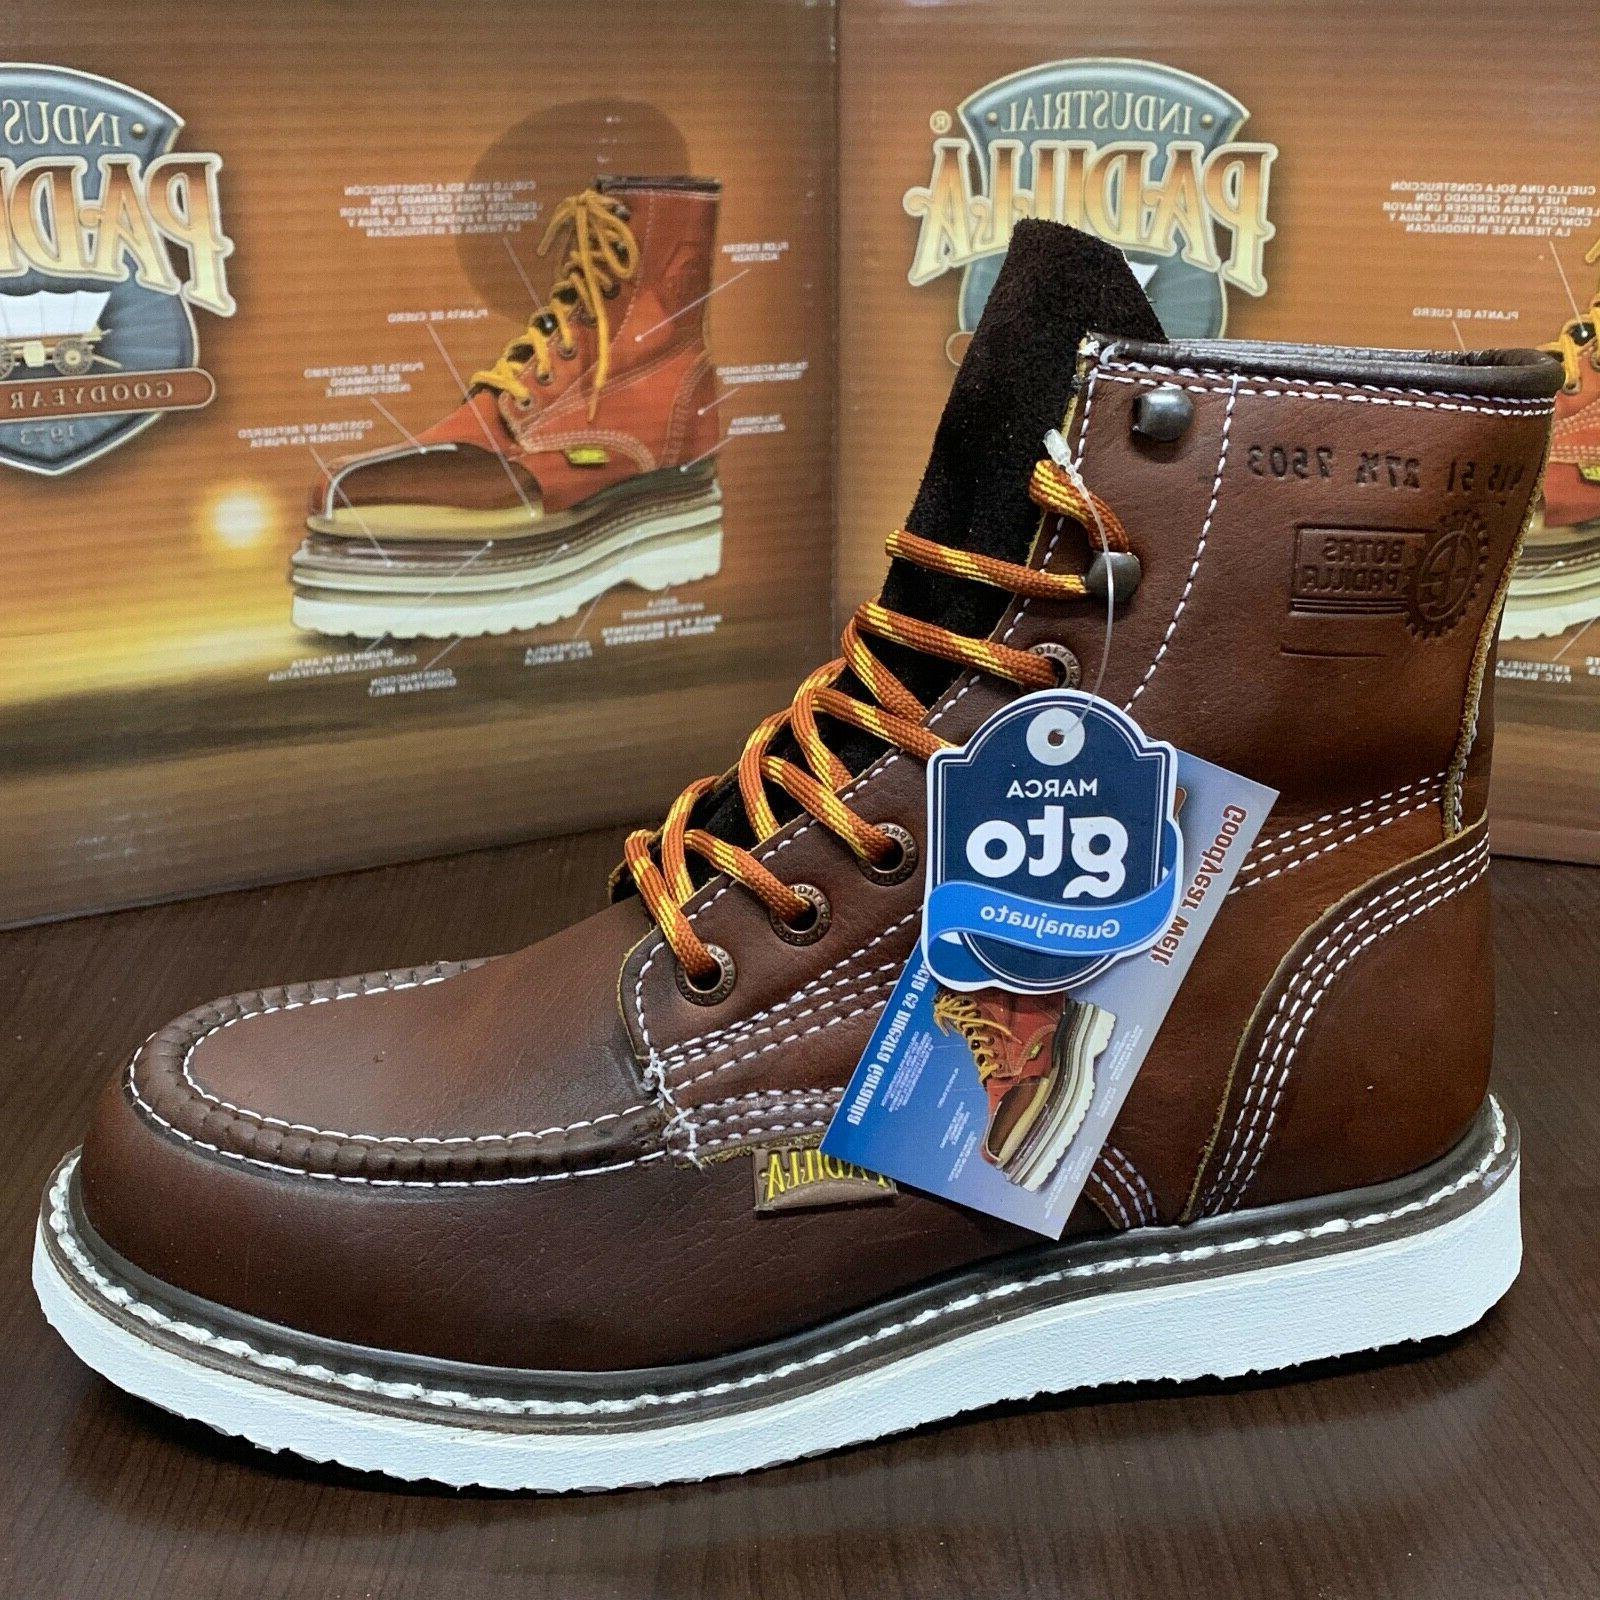 Men's Moc Toe Safety Resistant Work Boots